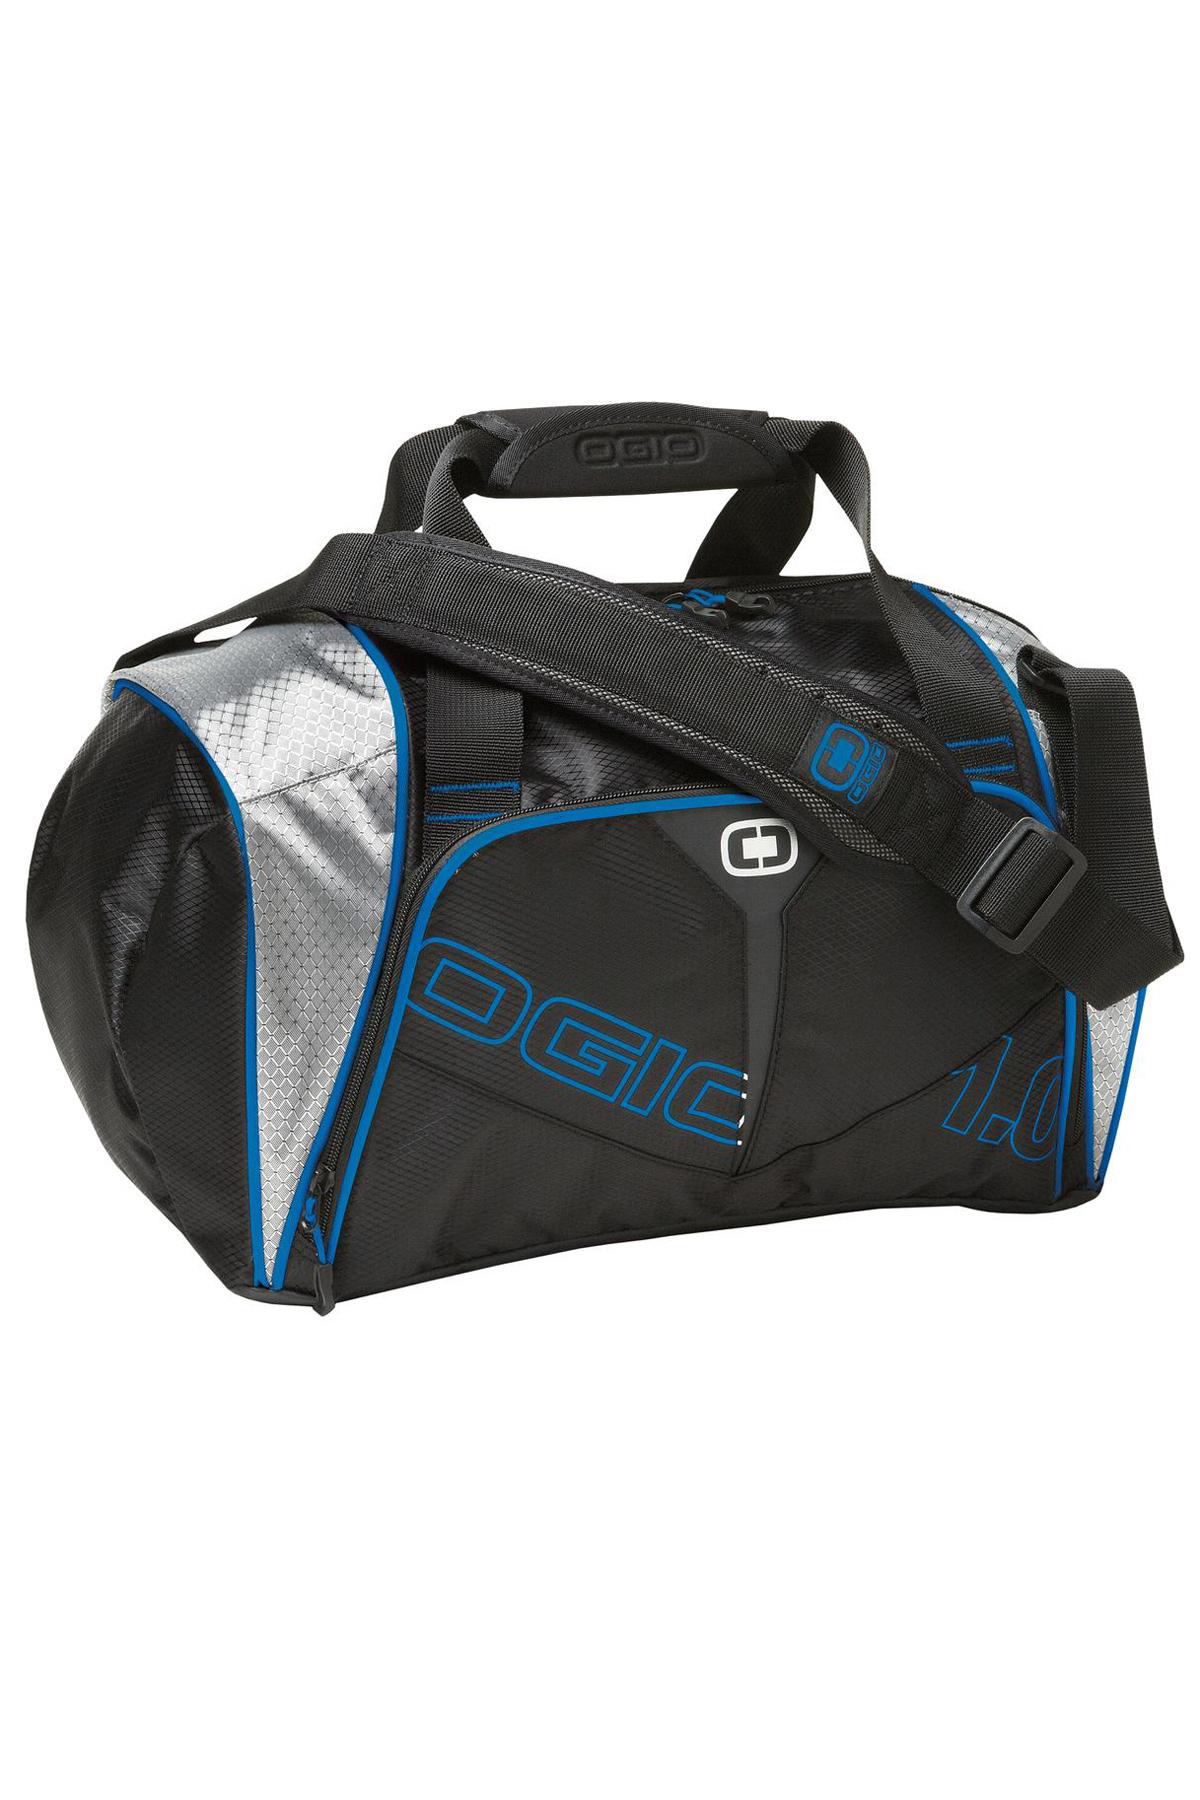 Bags-Duffels-30